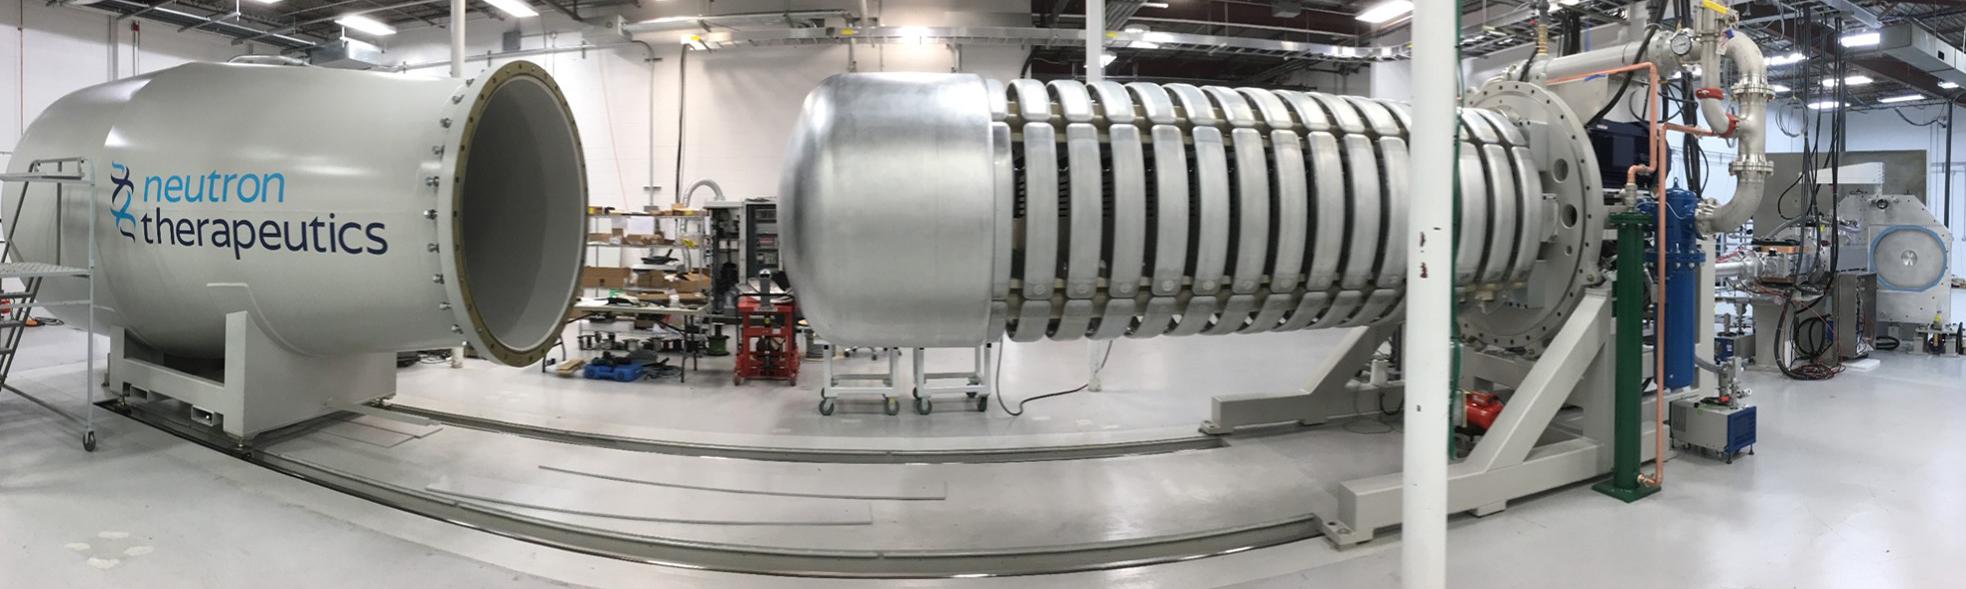 Proton Accelerator for BNCT